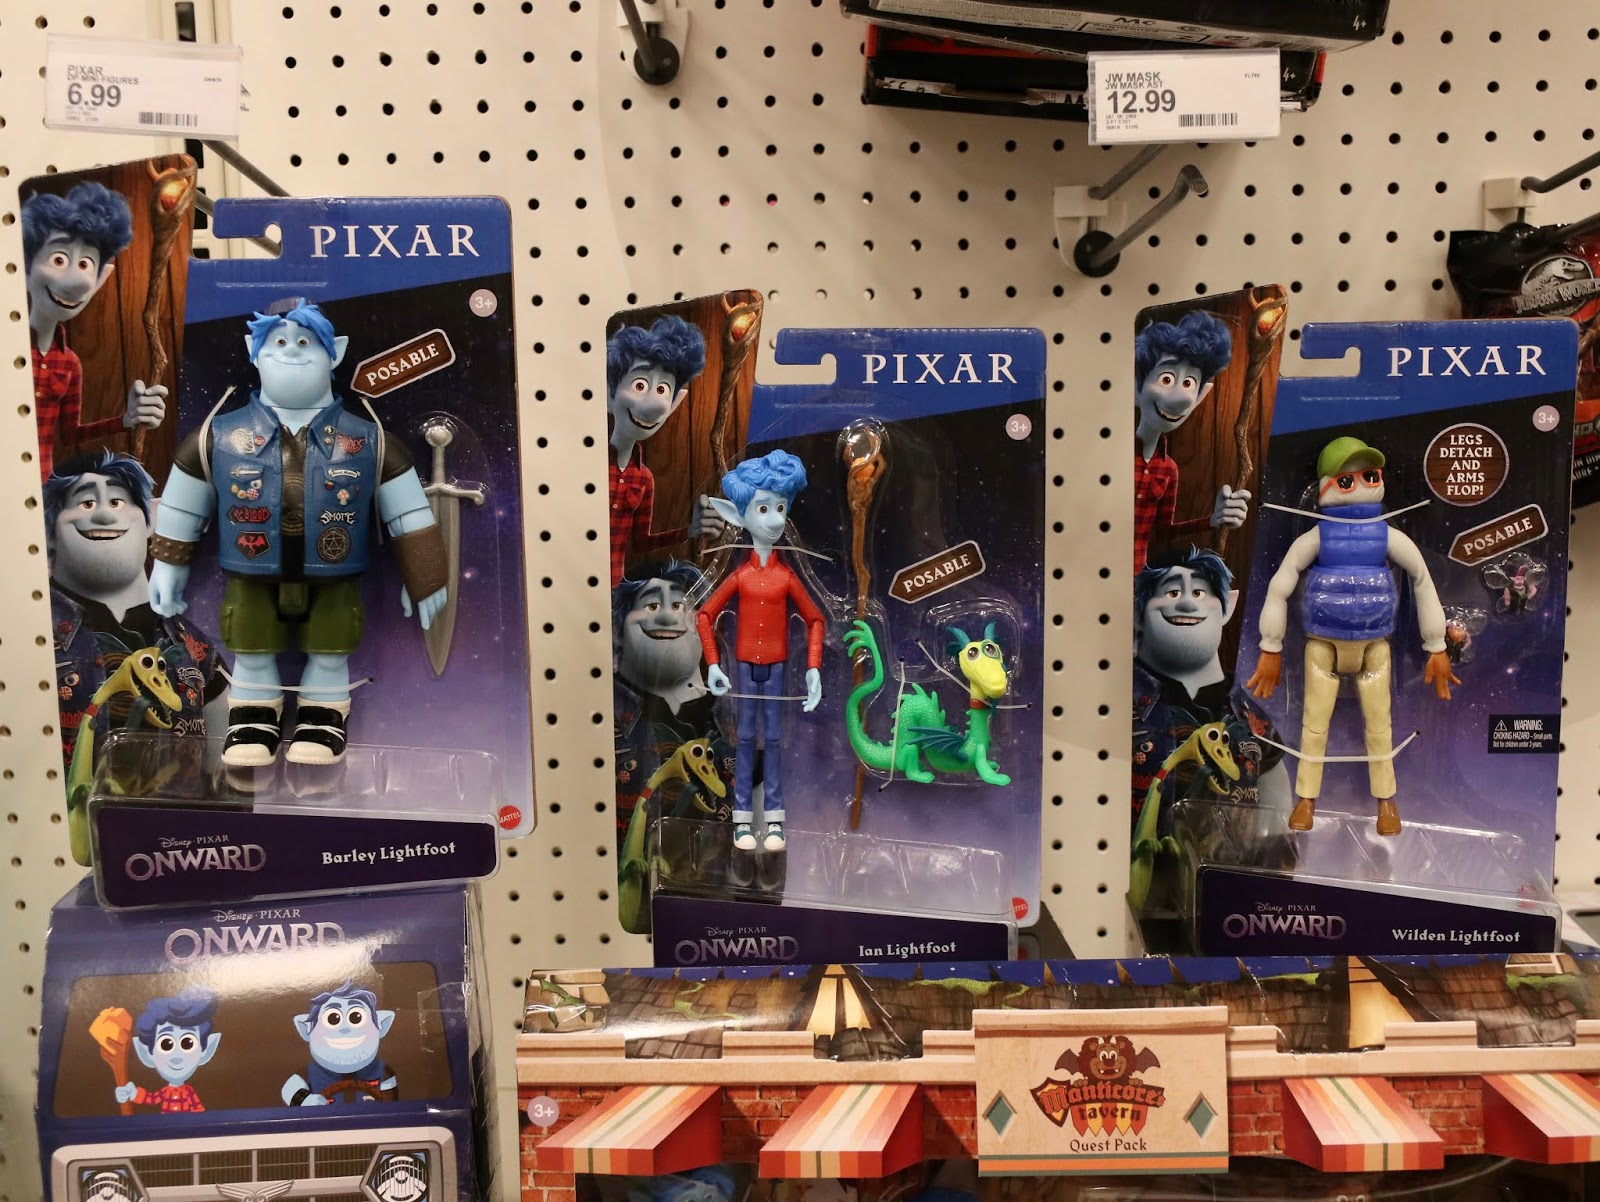 Pixar onward action figures, Ian, Barley and Wilden